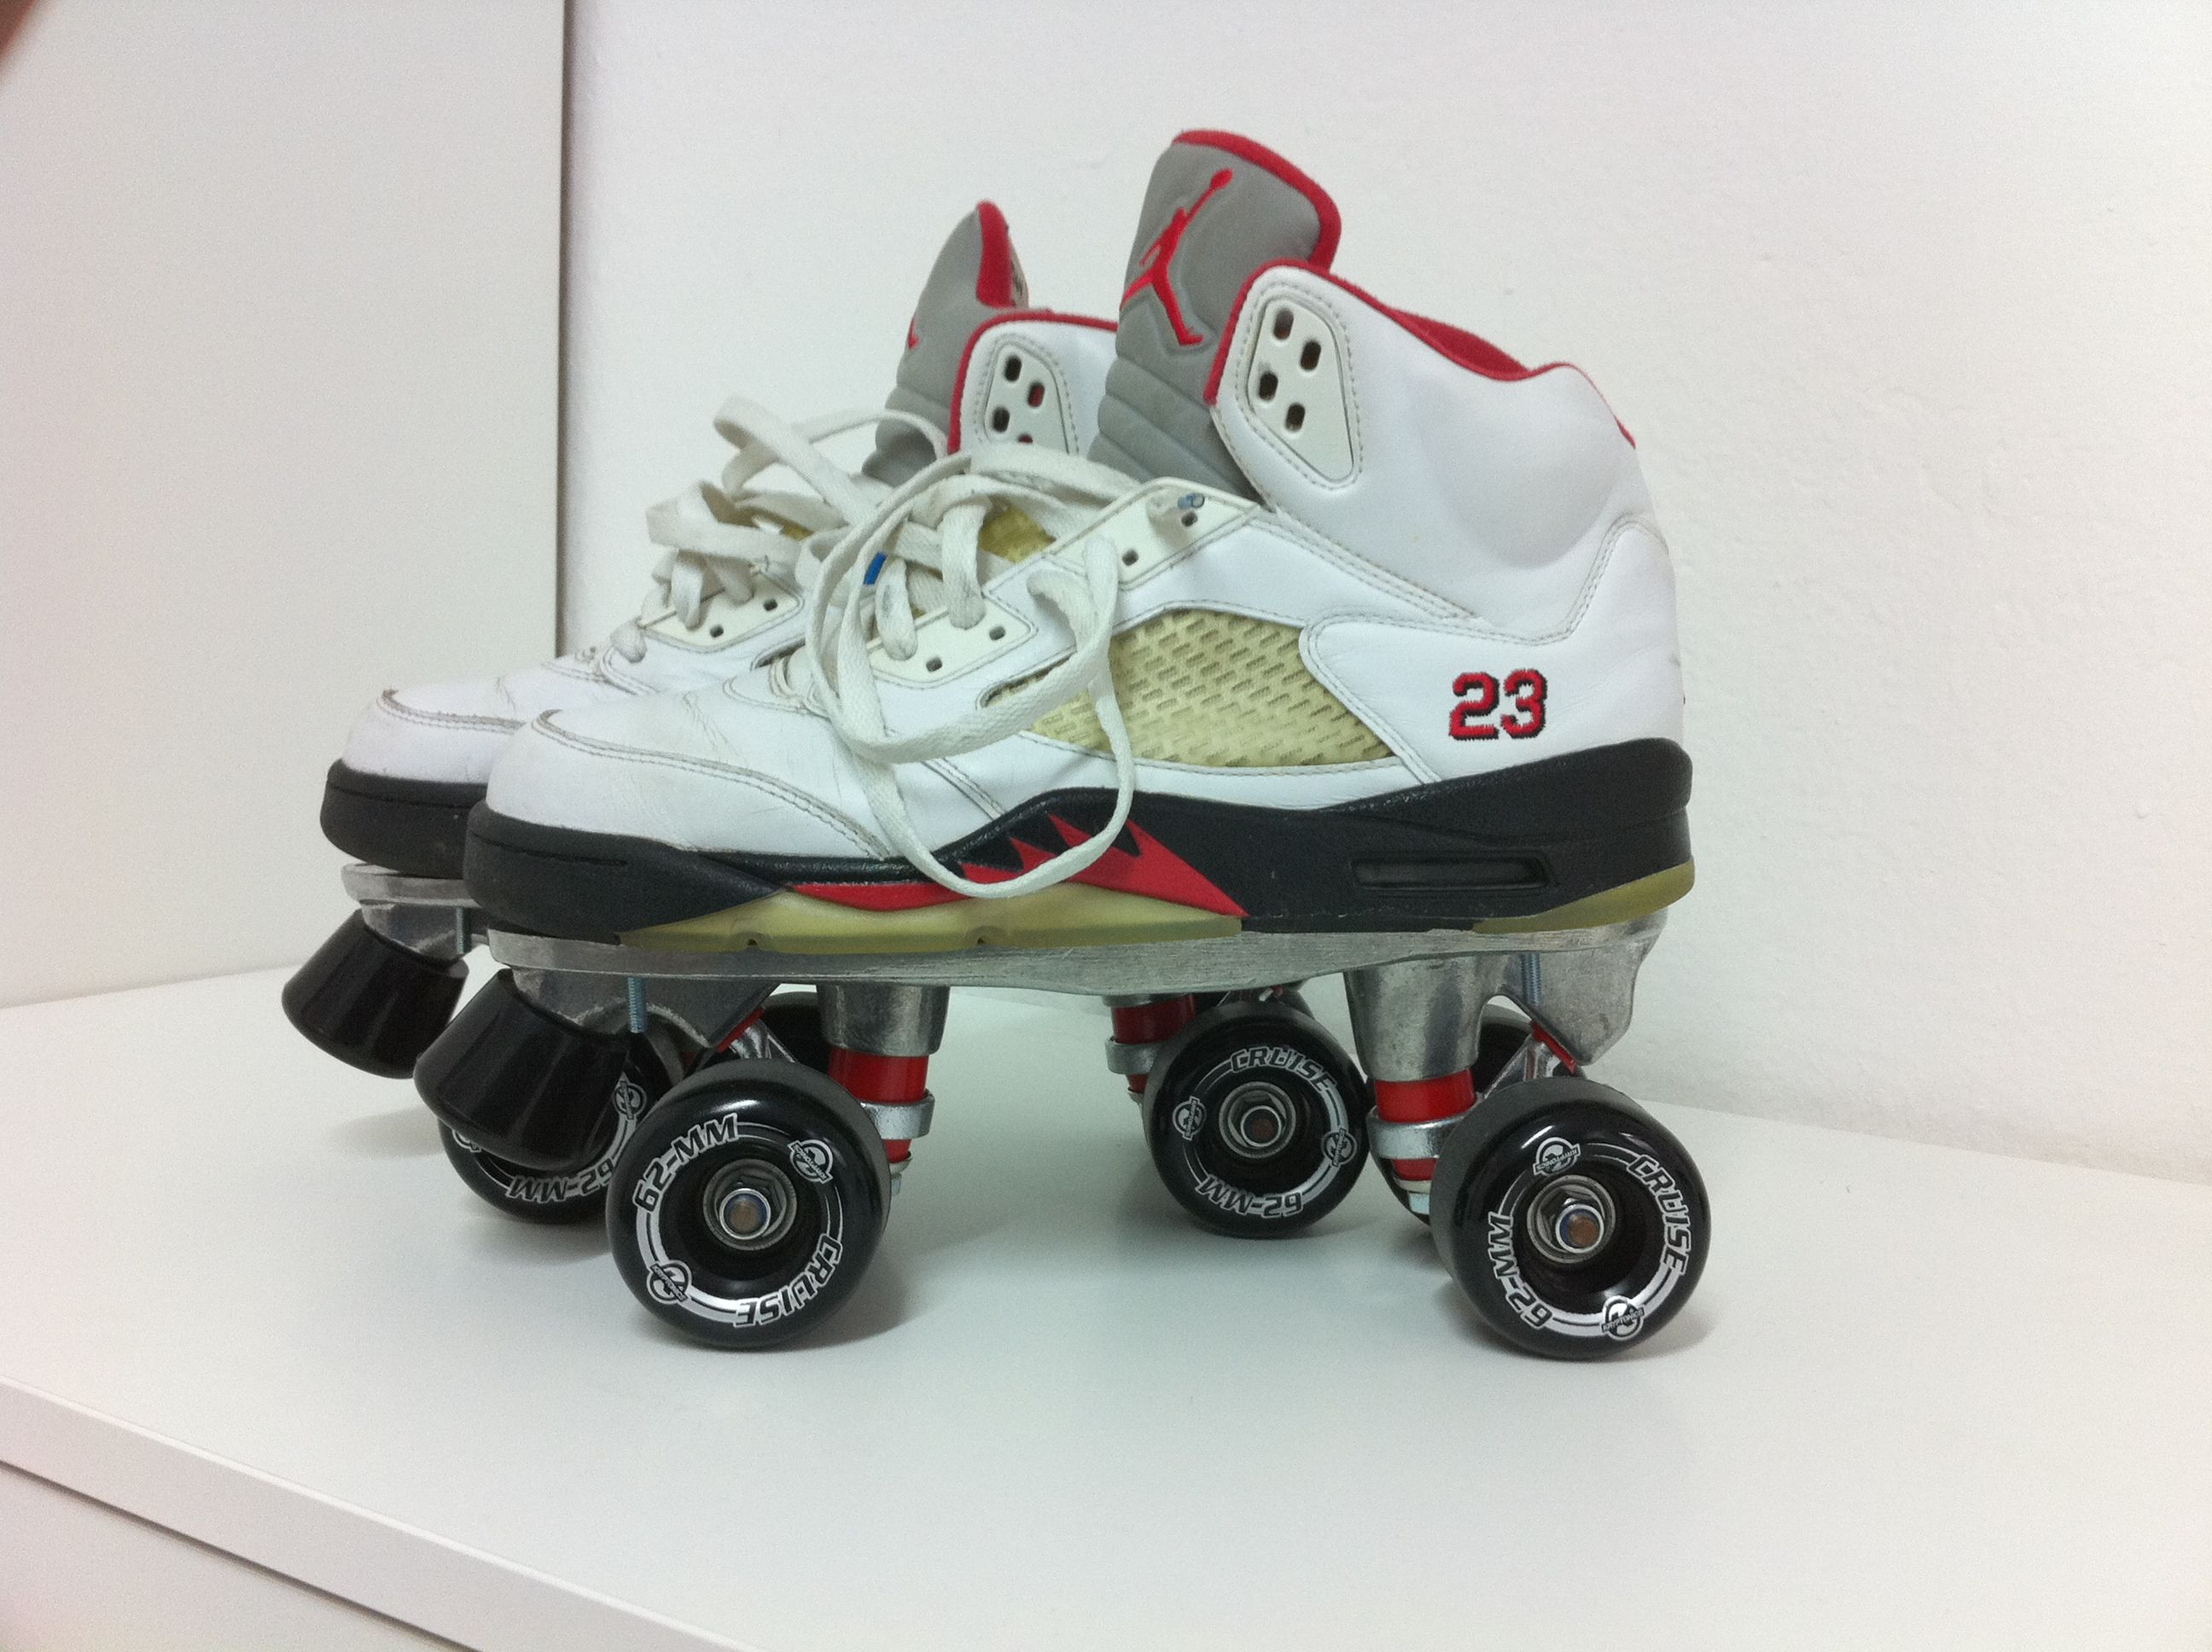 Innovativ Schuhe Air Jordan 5, Platte Formula1 Alu, Rollen Kryptonics Cruise  KP45